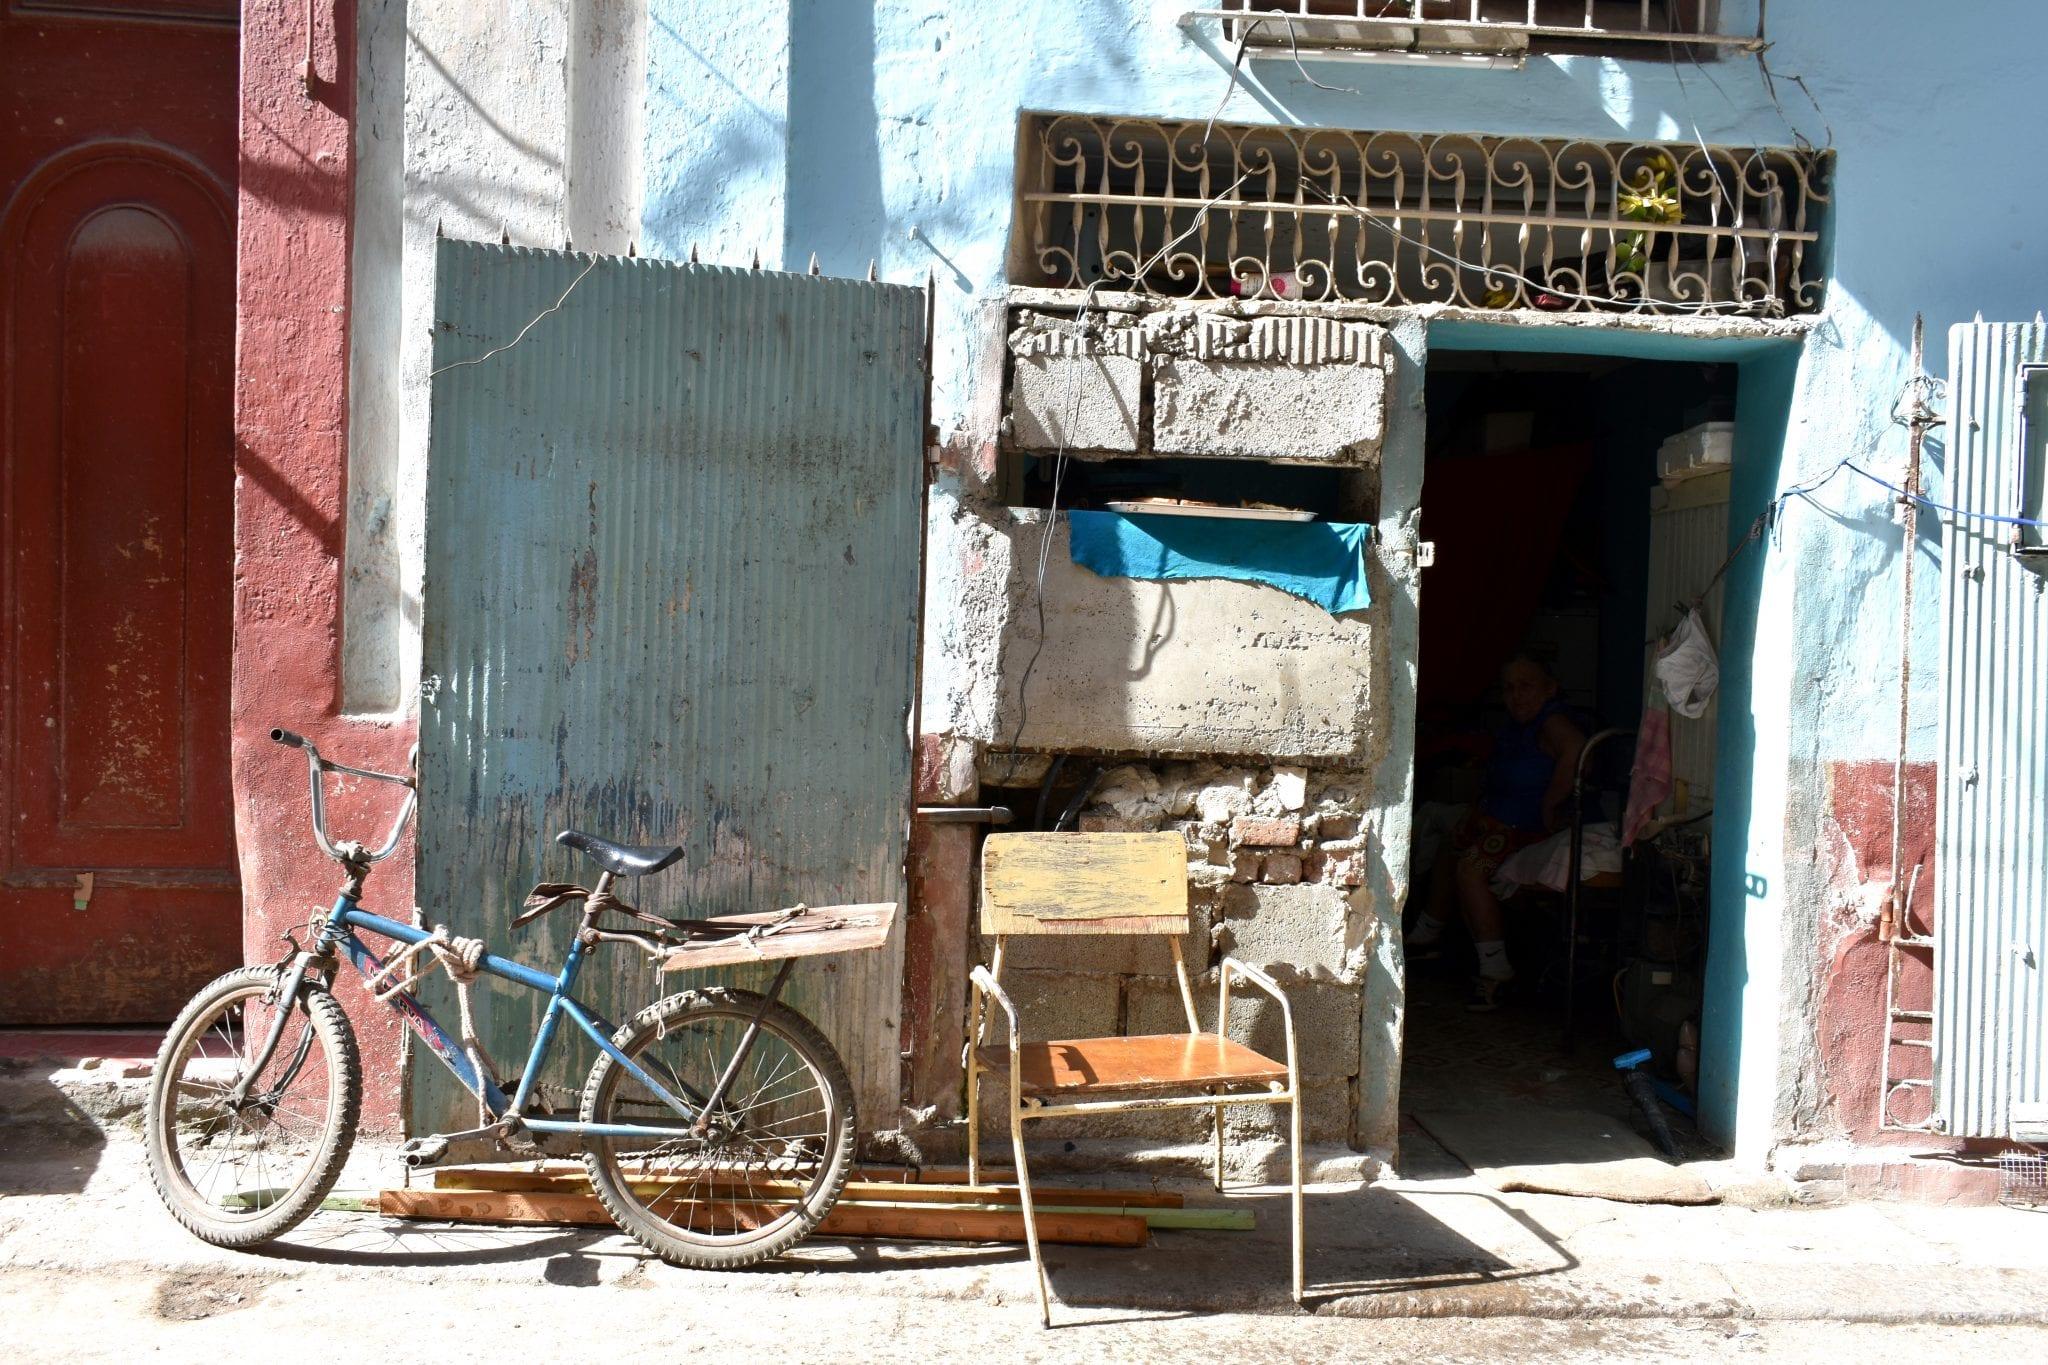 Dettagli l'Avana - Cuba - Le Plume